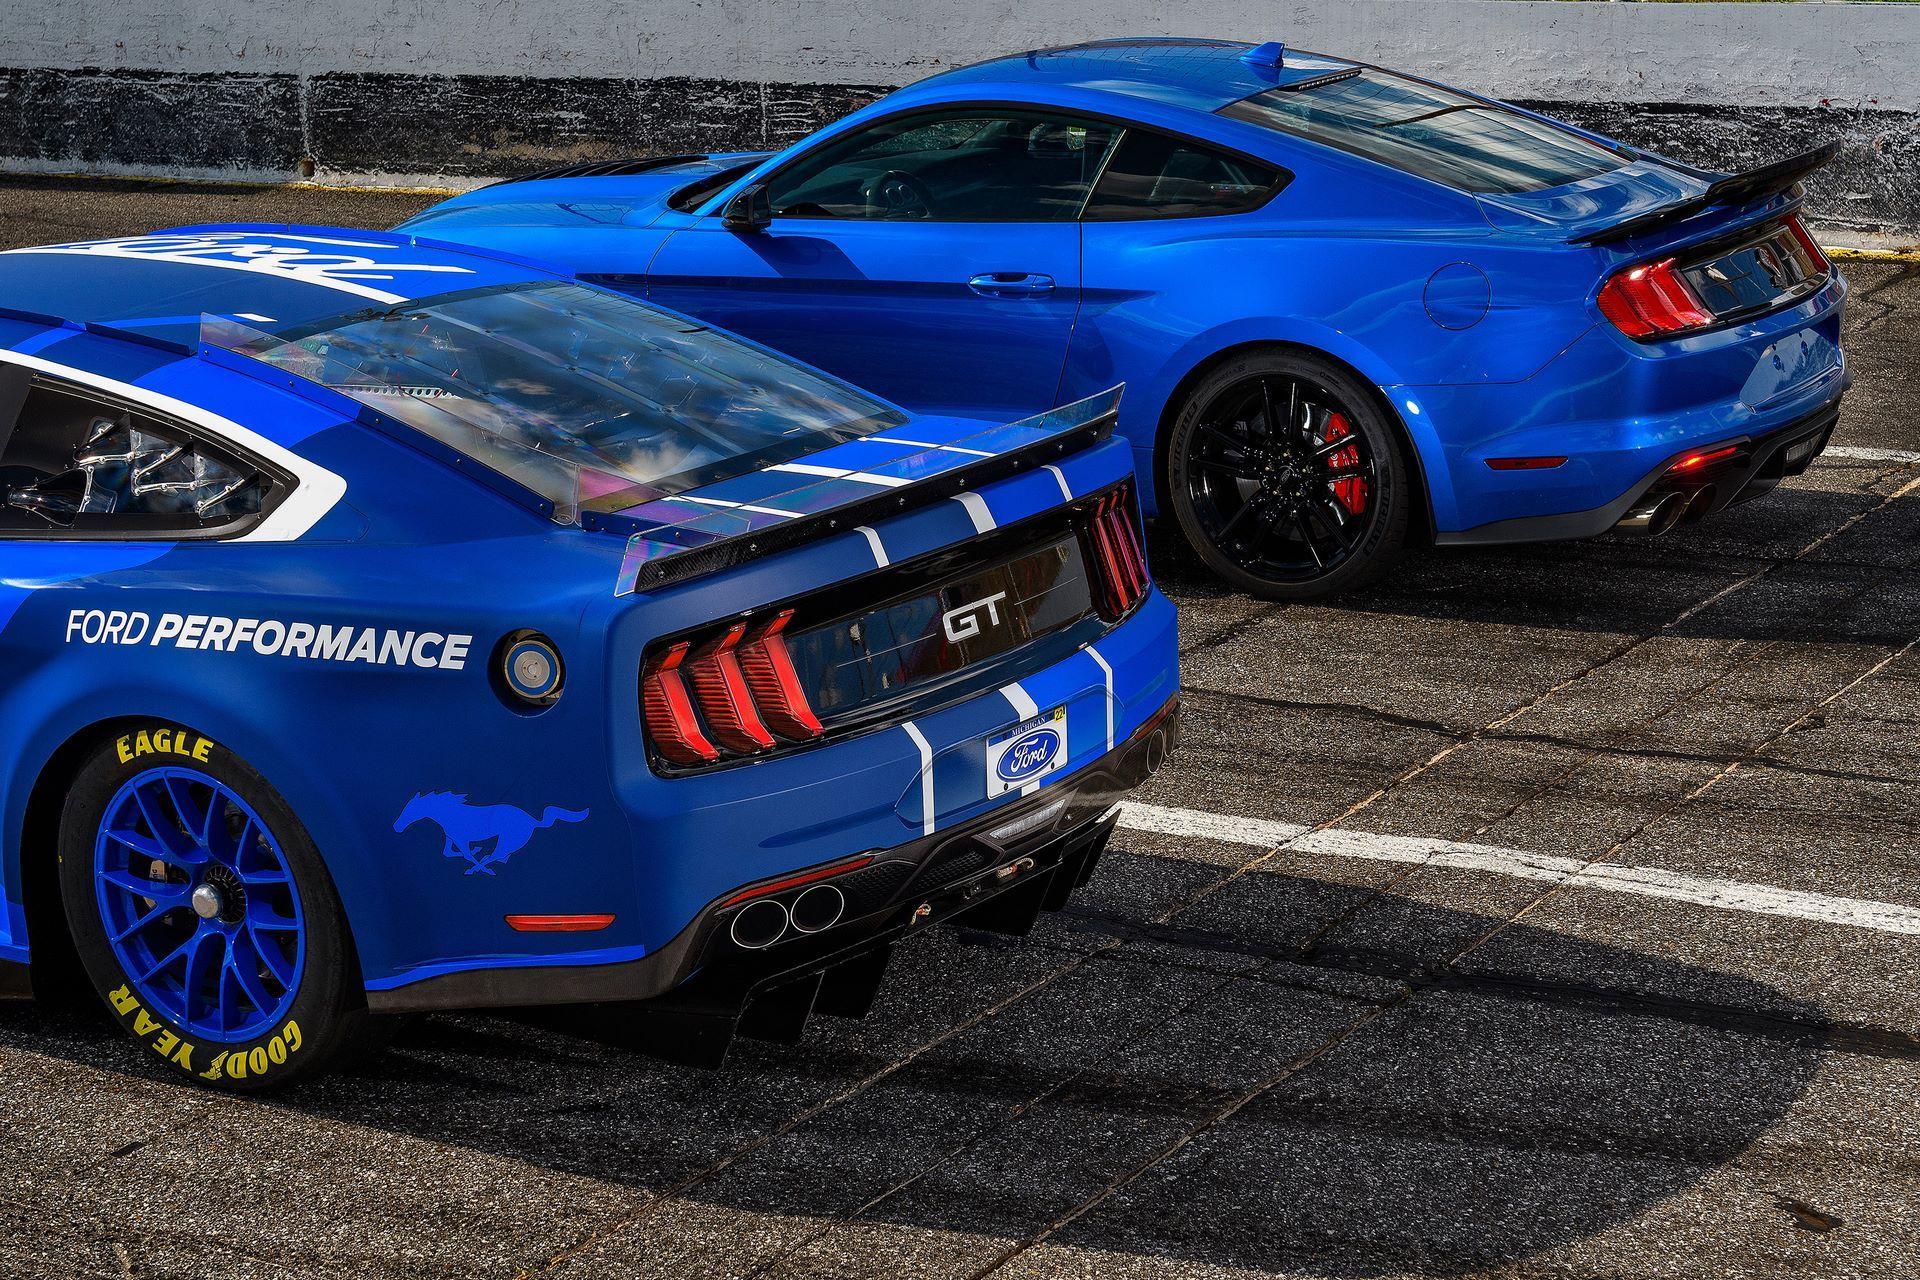 Ford-Mustang-Next-Gen-Nascar-12